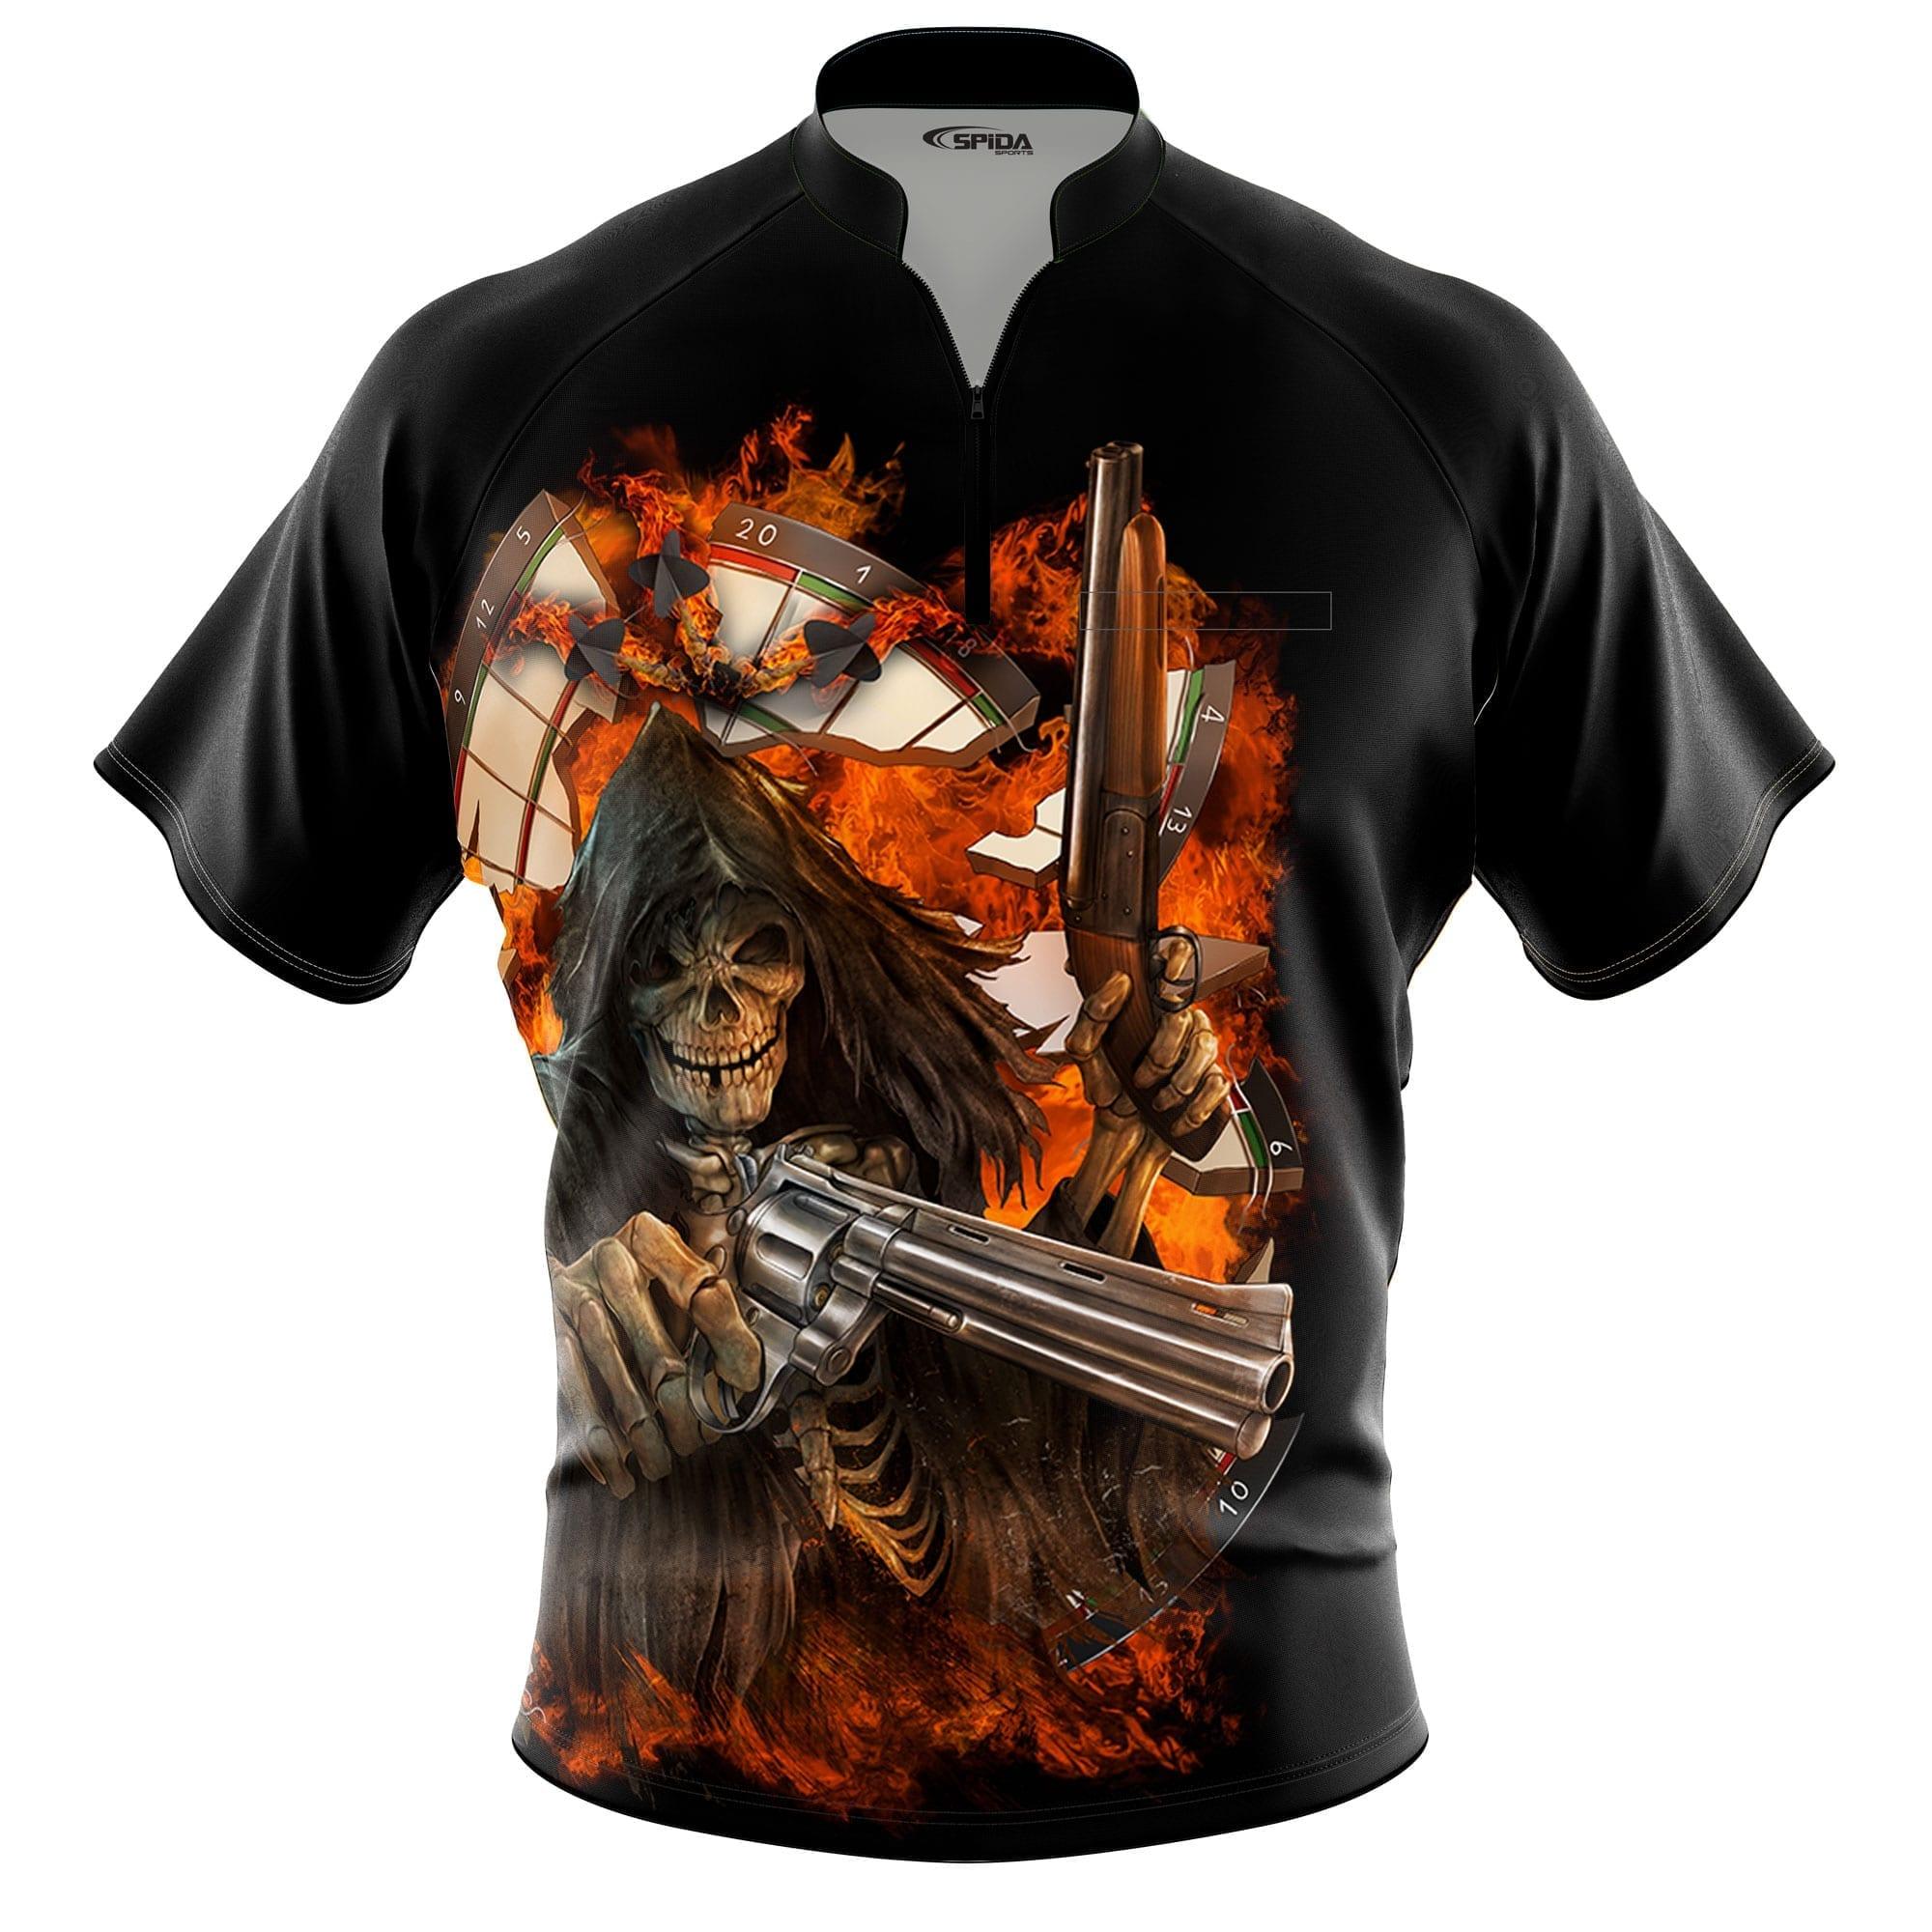 Grim-Reaper-dart-shirt-front-3d